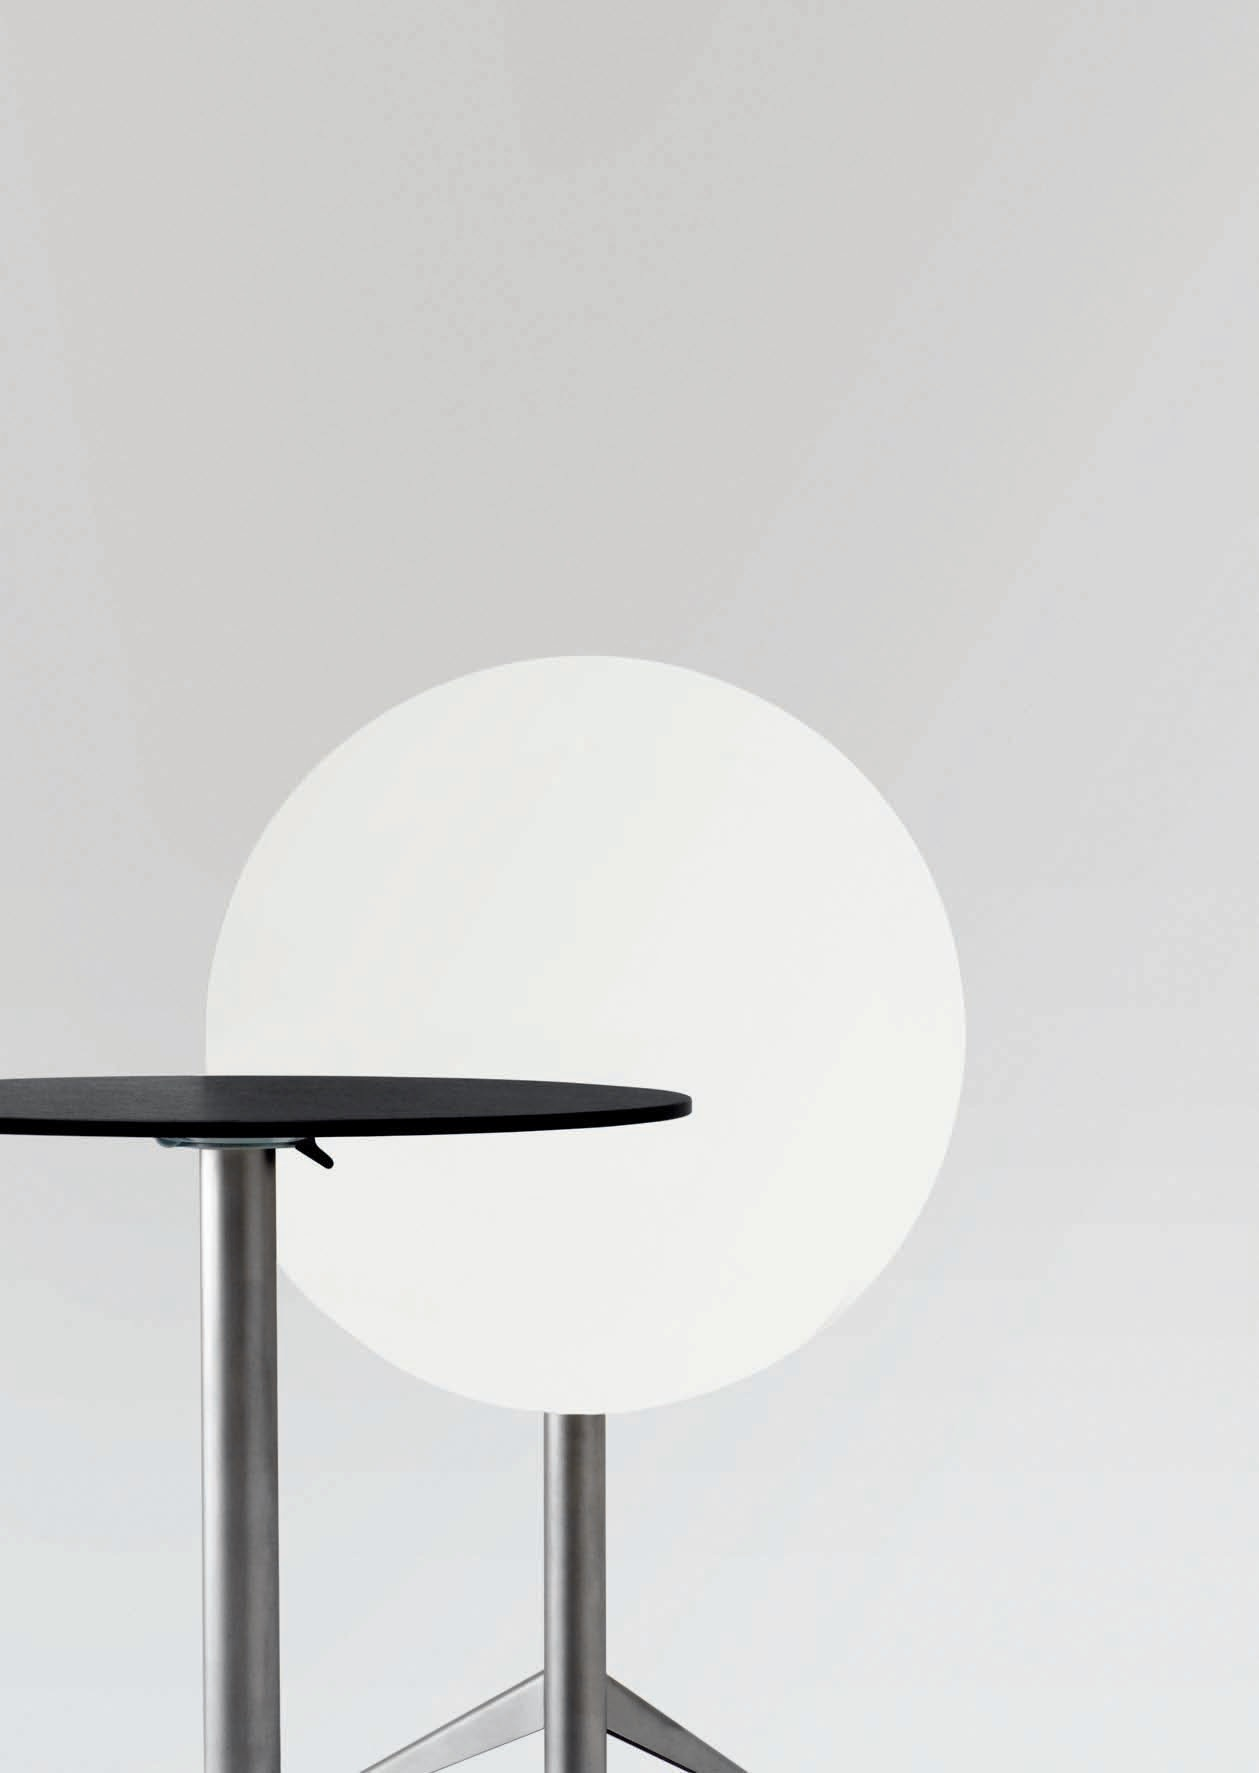 Seltz table ronde by lapalma design romano marcato - Table ronde rabattable ...